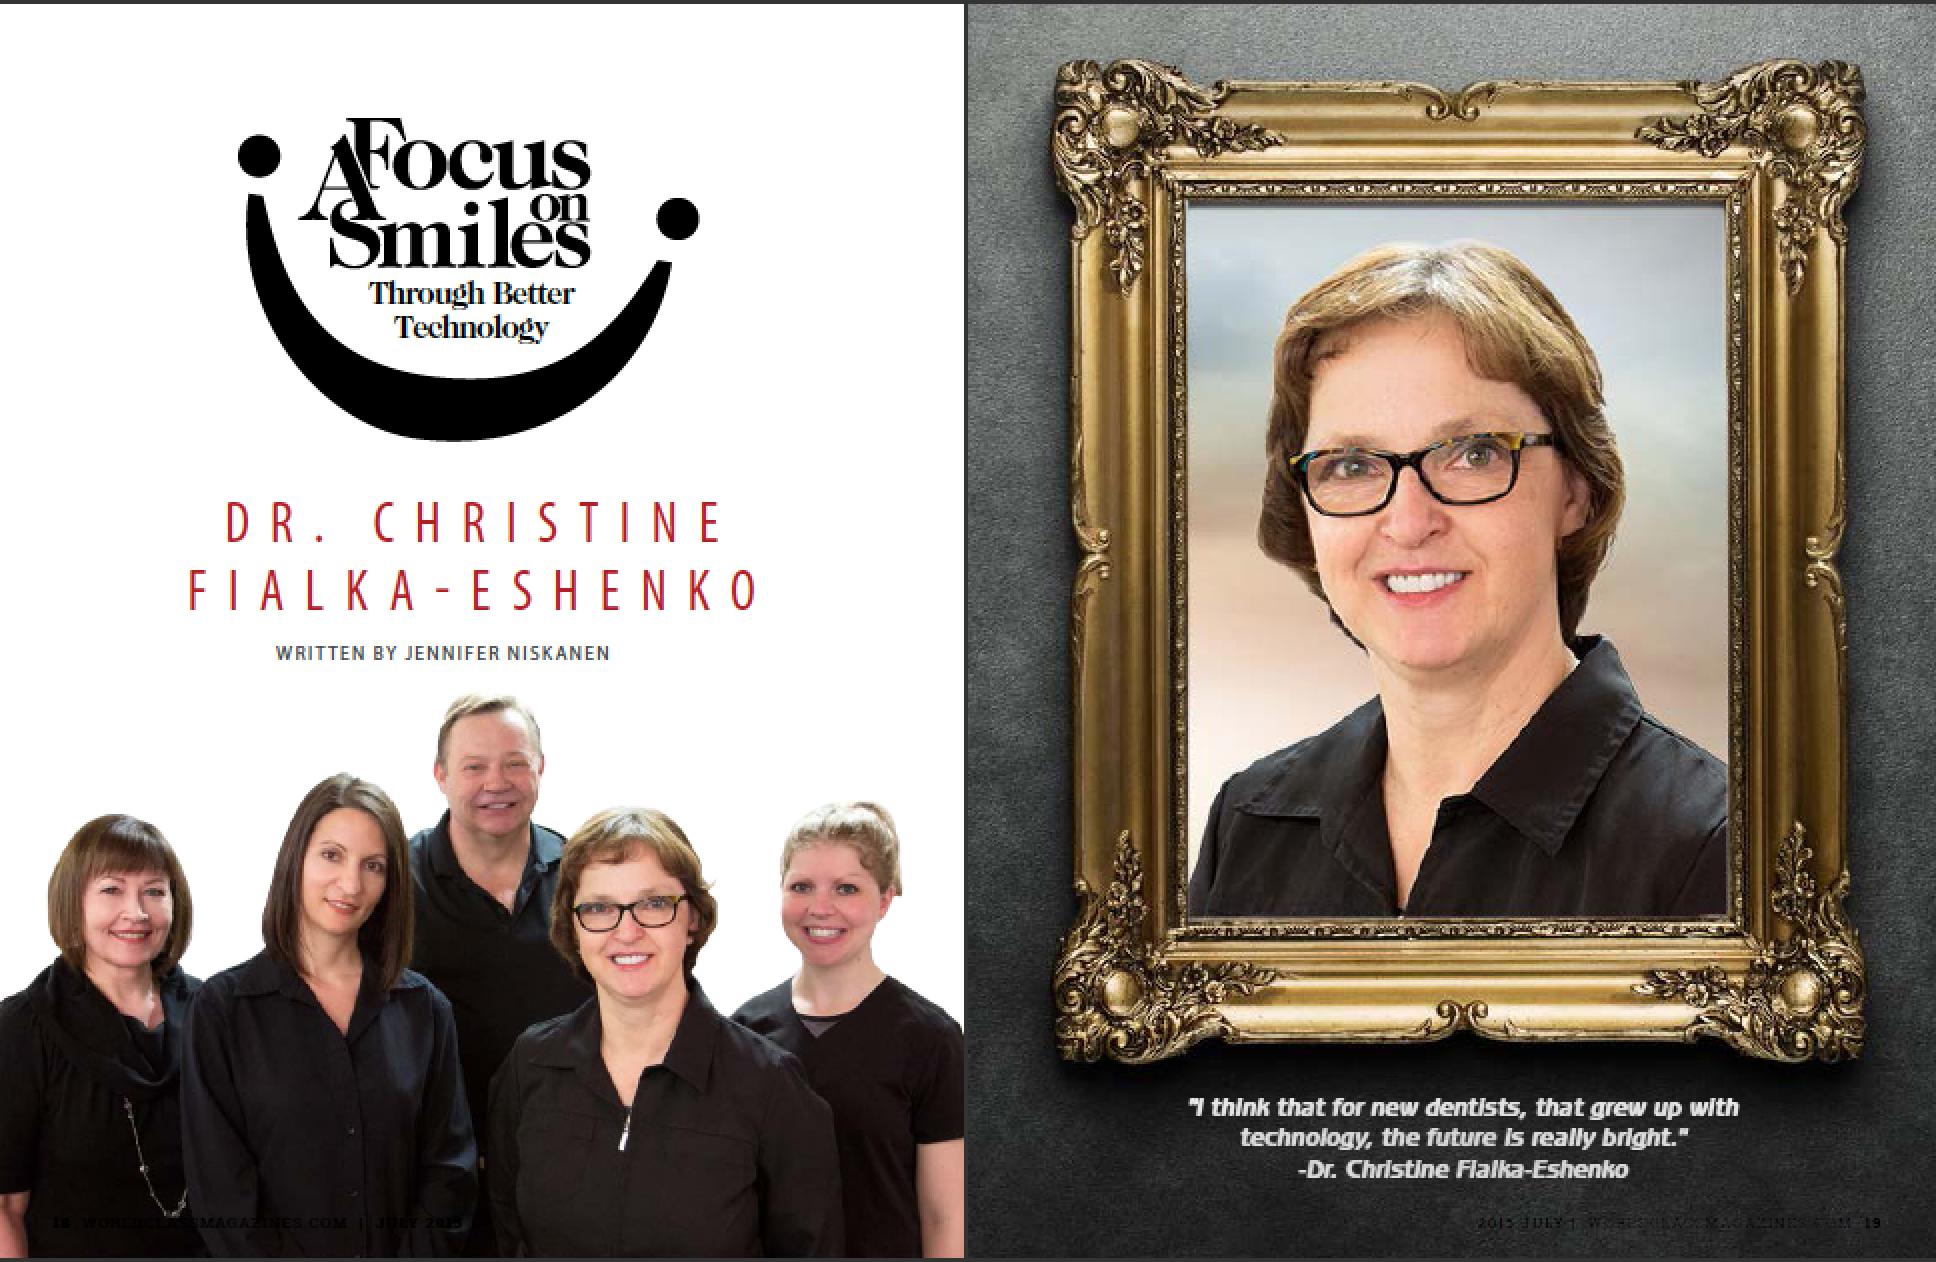 dr christine filch eshenko